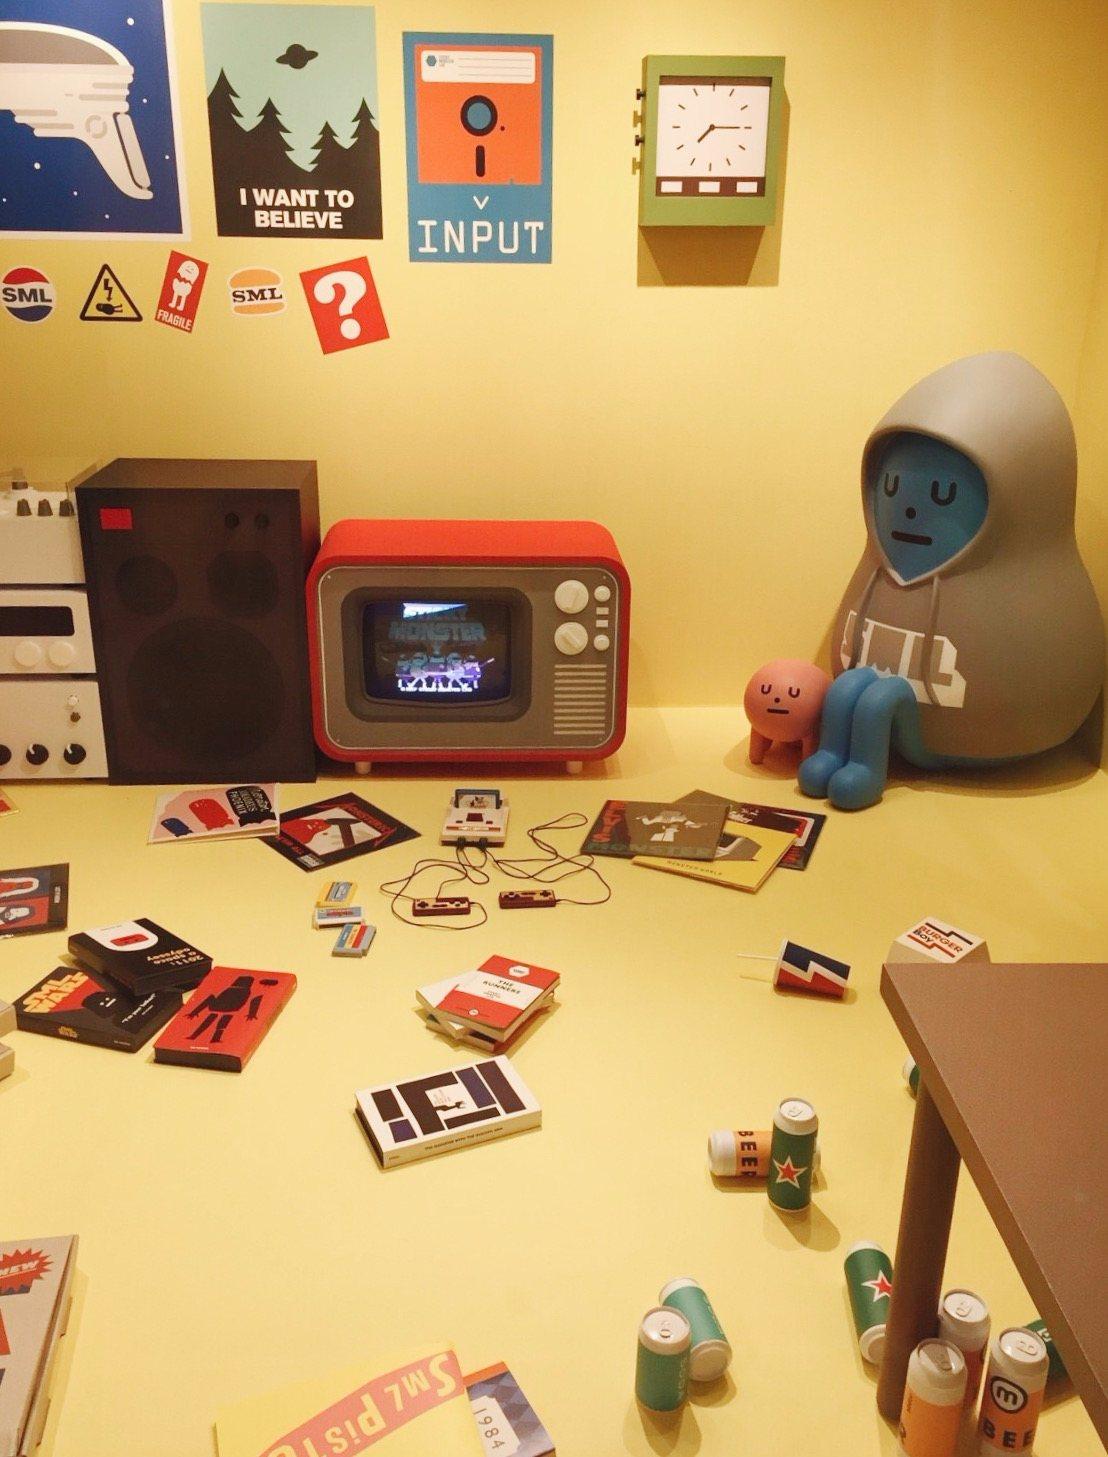 SML動畫中的名場面(?) The Loner的家,每個動畫裡的物品都被認真的做出來了,超級用心啊~ 是說看到這個覺得很有親切感,因為髮捲姊的房間也差不多這麼亂吧XDD